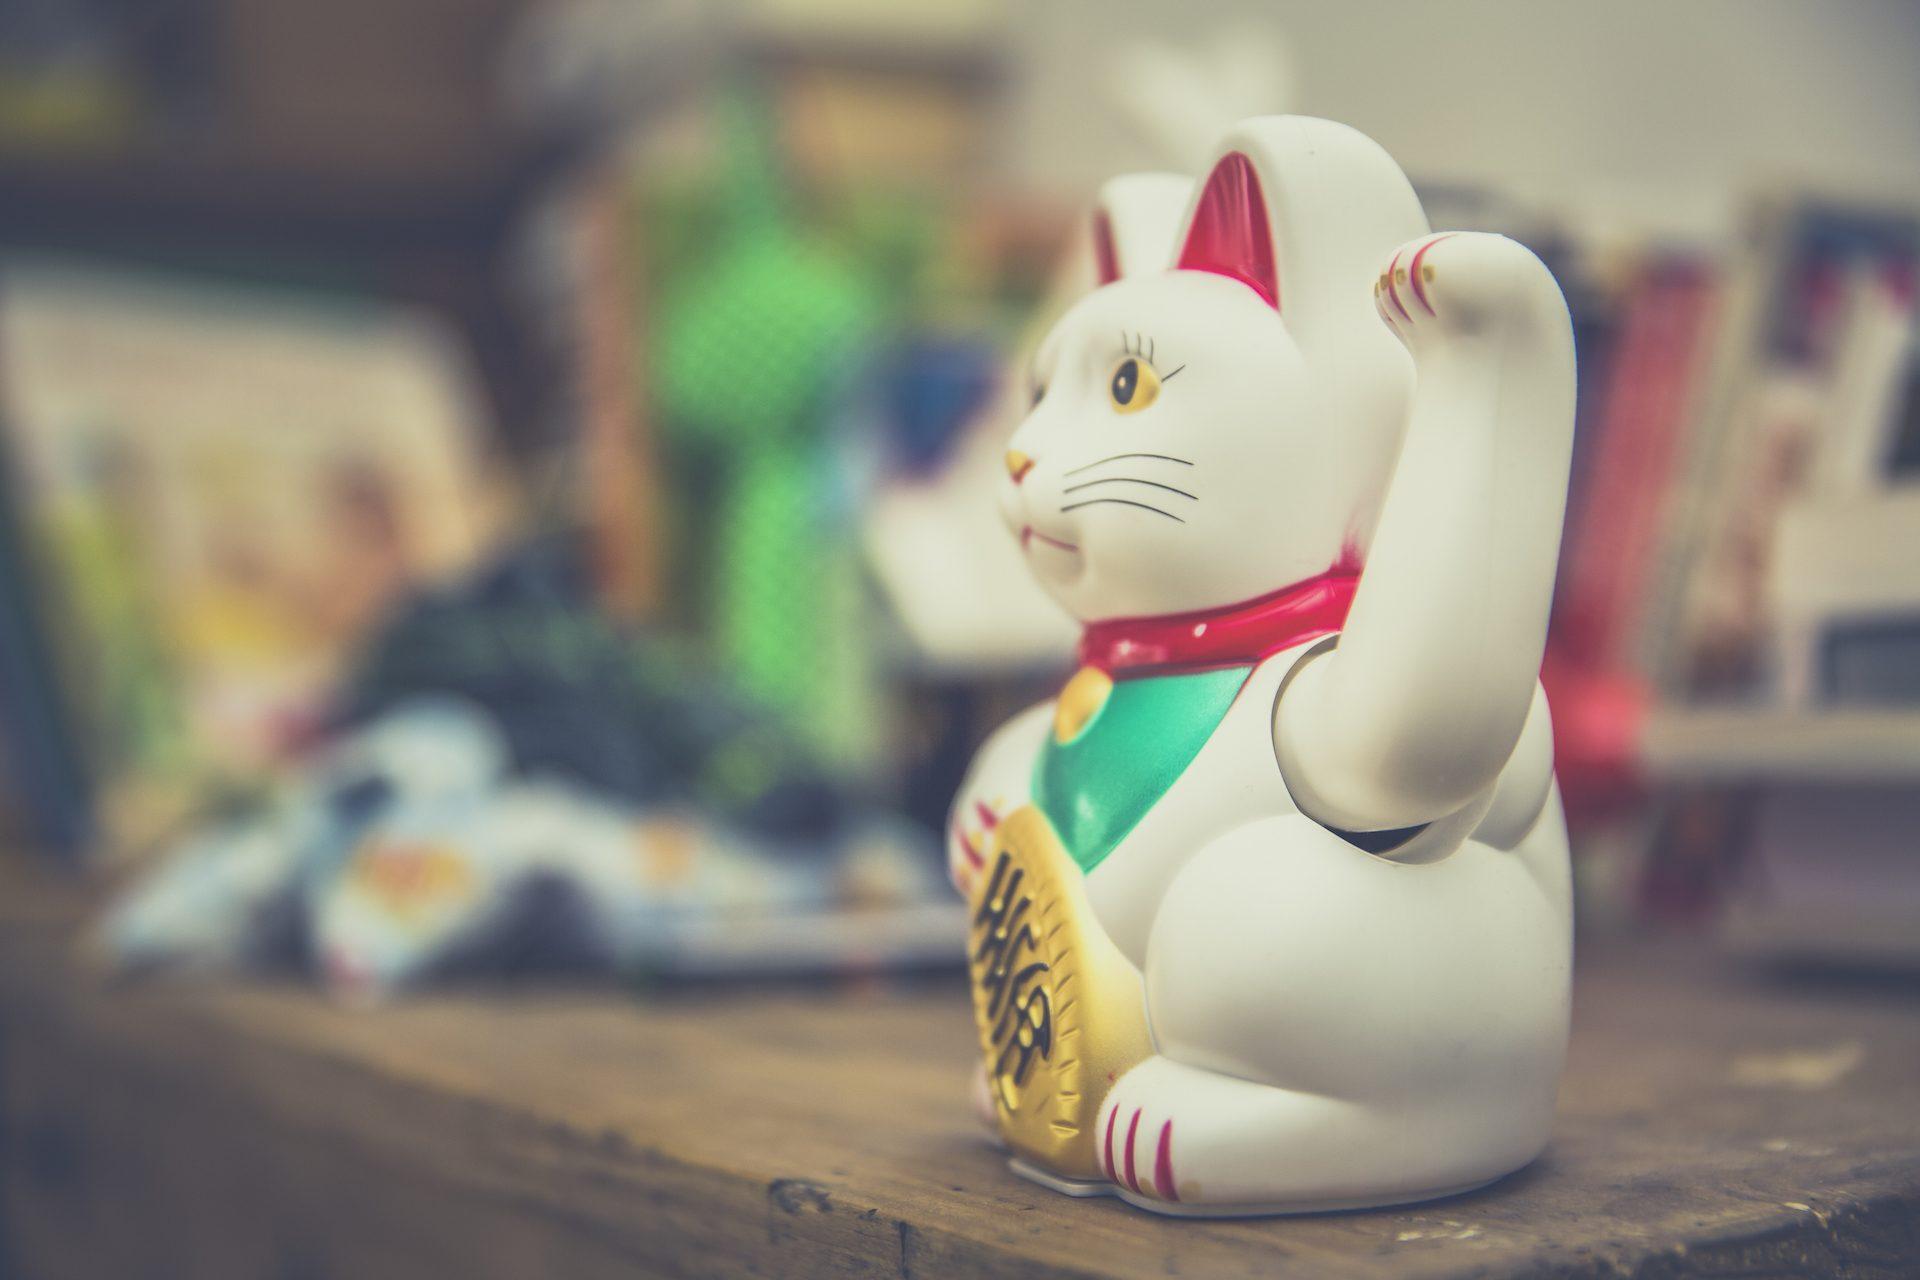 gato, chino, suerte, destino, blanco - Fondos de Pantalla HD - professor-falken.com